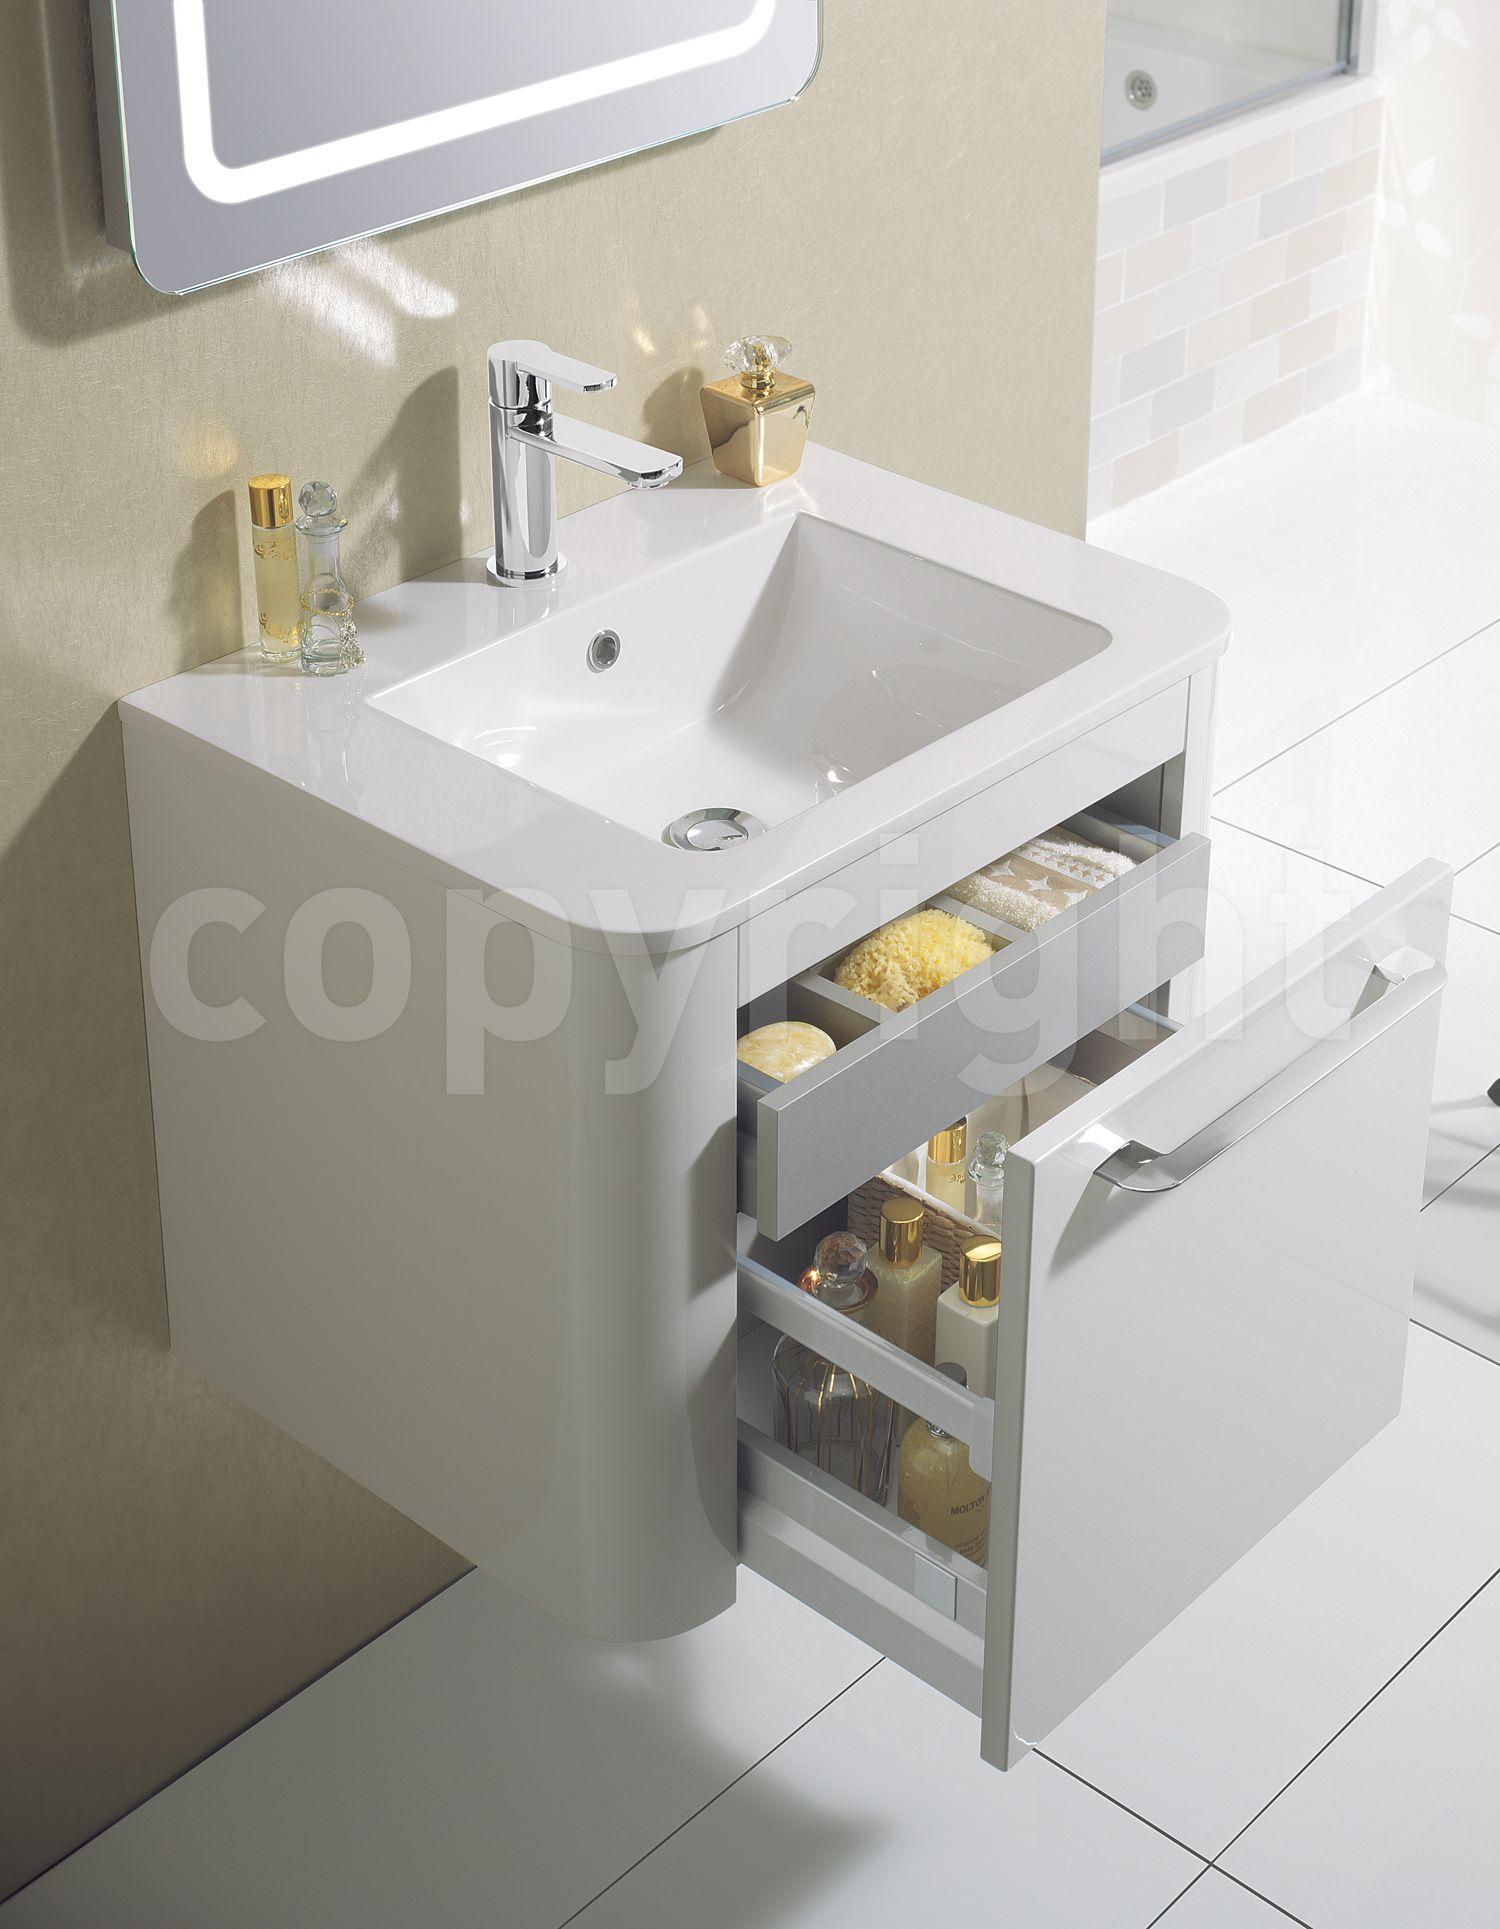 Bauhaus Armaturen Badezimmer Mobel Design Badezimmer Mobel Ideen Ikea Badezimmer Mobel Bett Dolaplar Banyo Dolabi Banyo